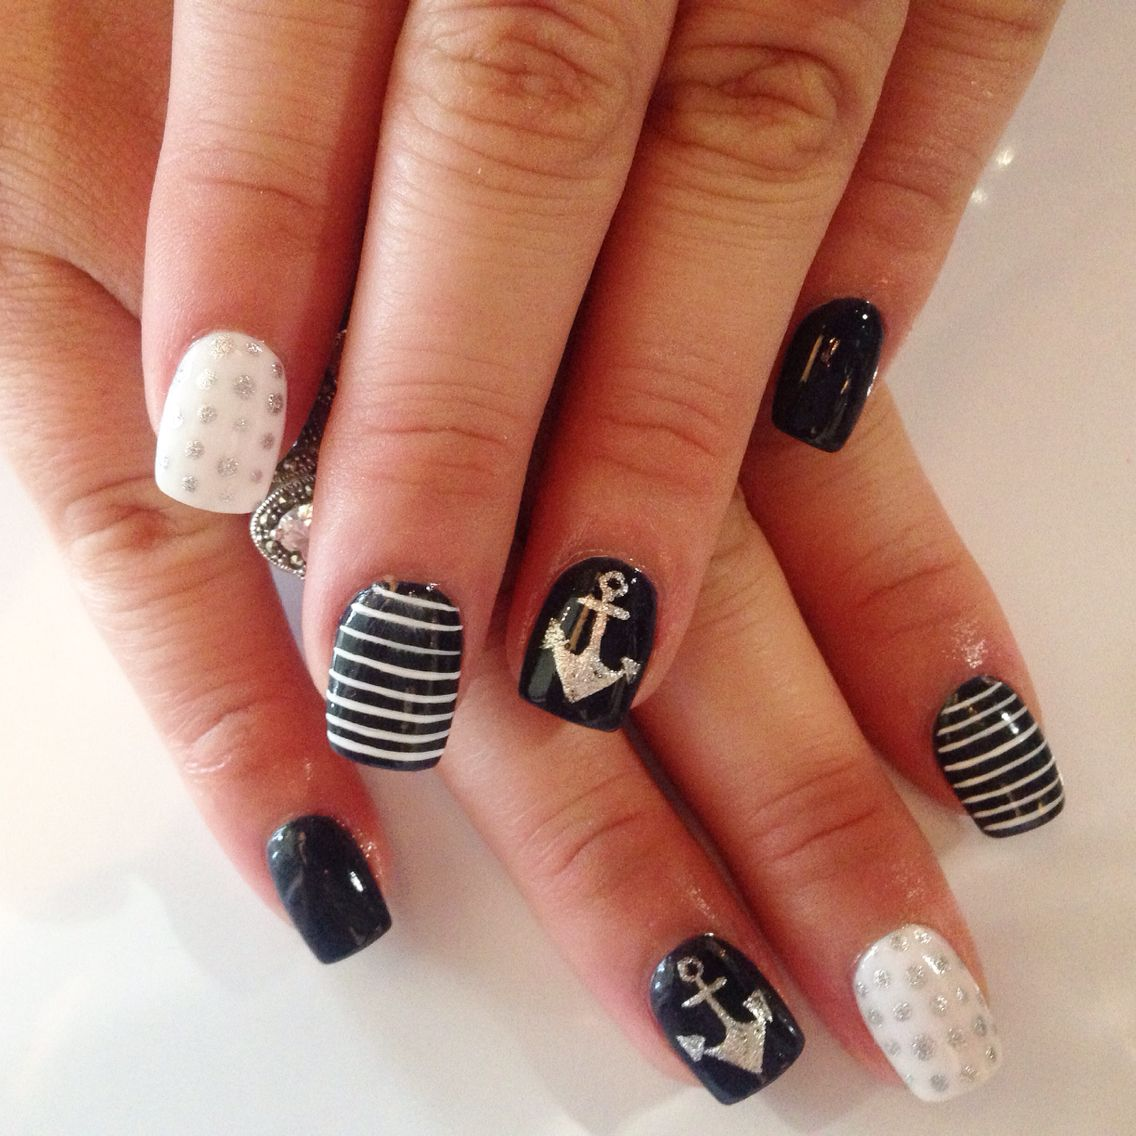 Nexgen nails   Nail art   Pinterest